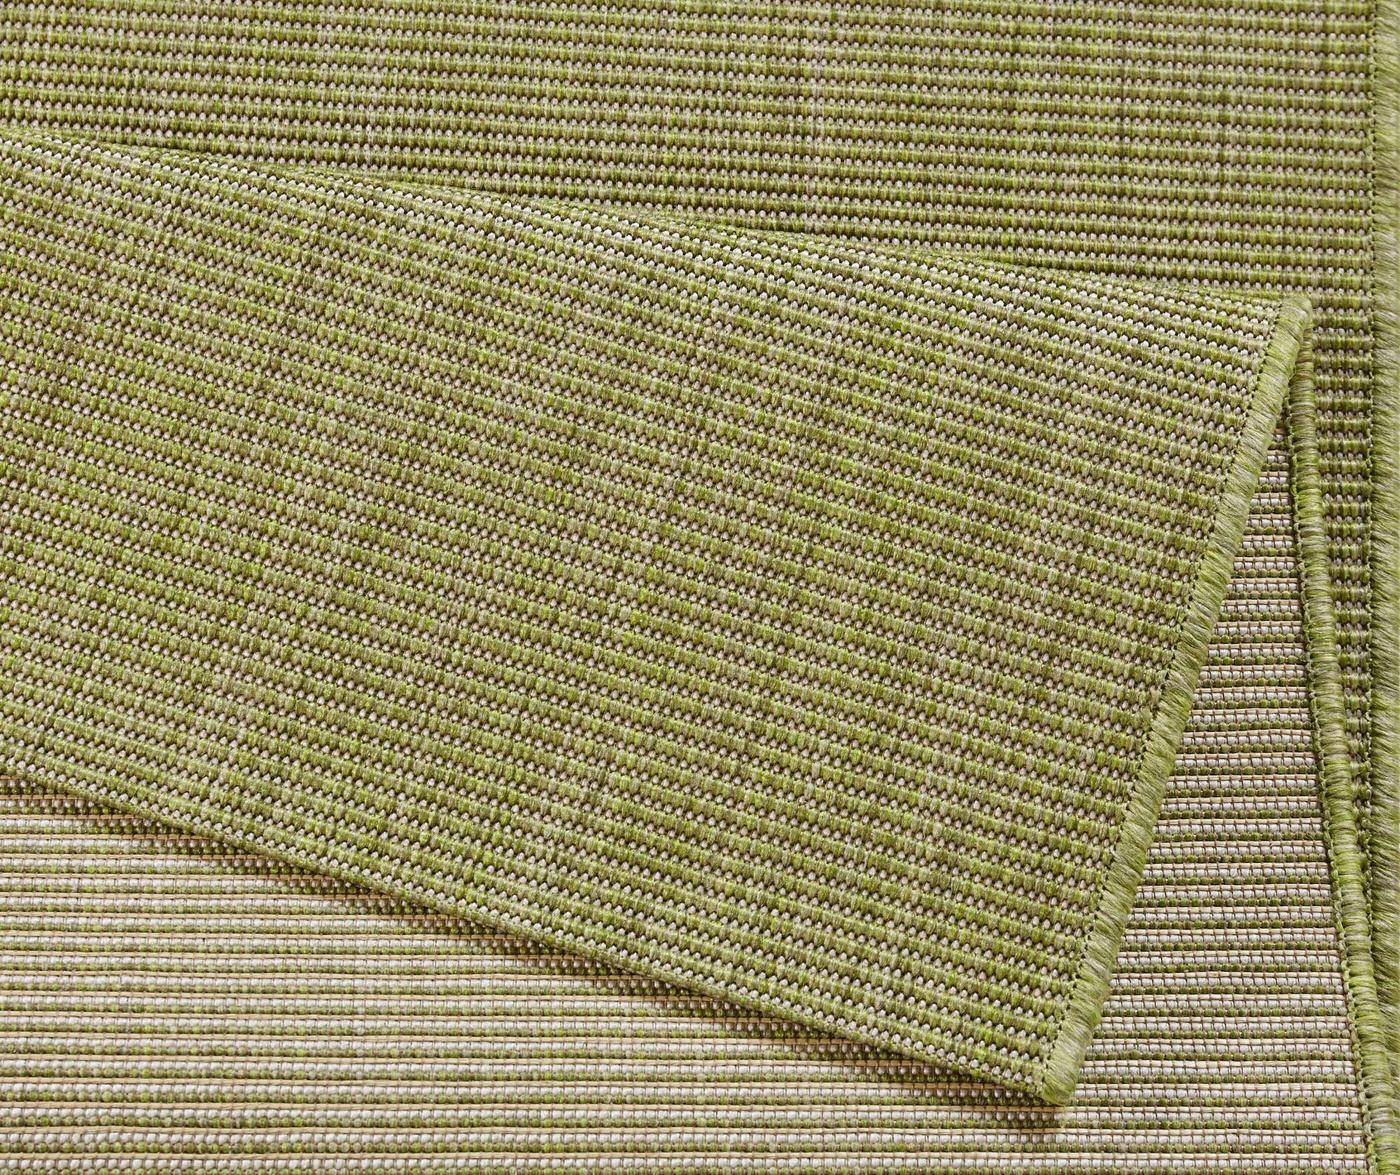 Zunanja preproga Meadow Match Green 120x170 cm